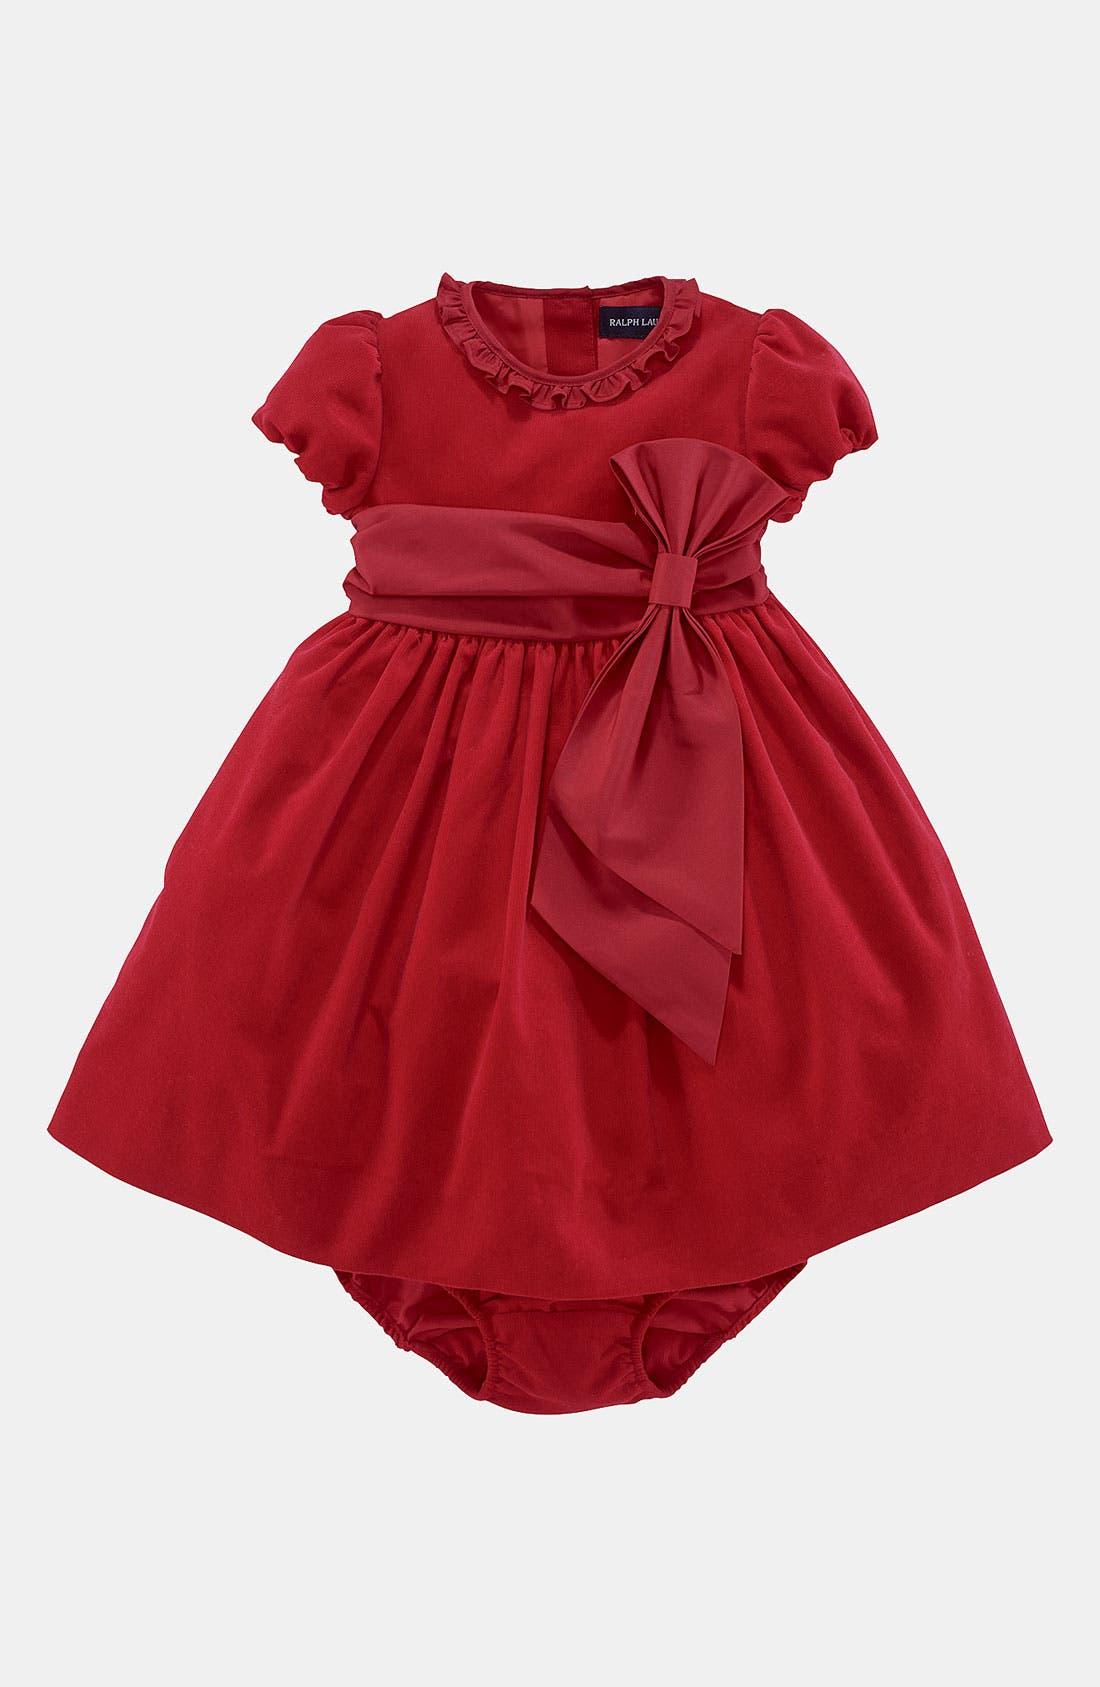 Main Image - Ralph Lauren Corduroy Dress (Infant)